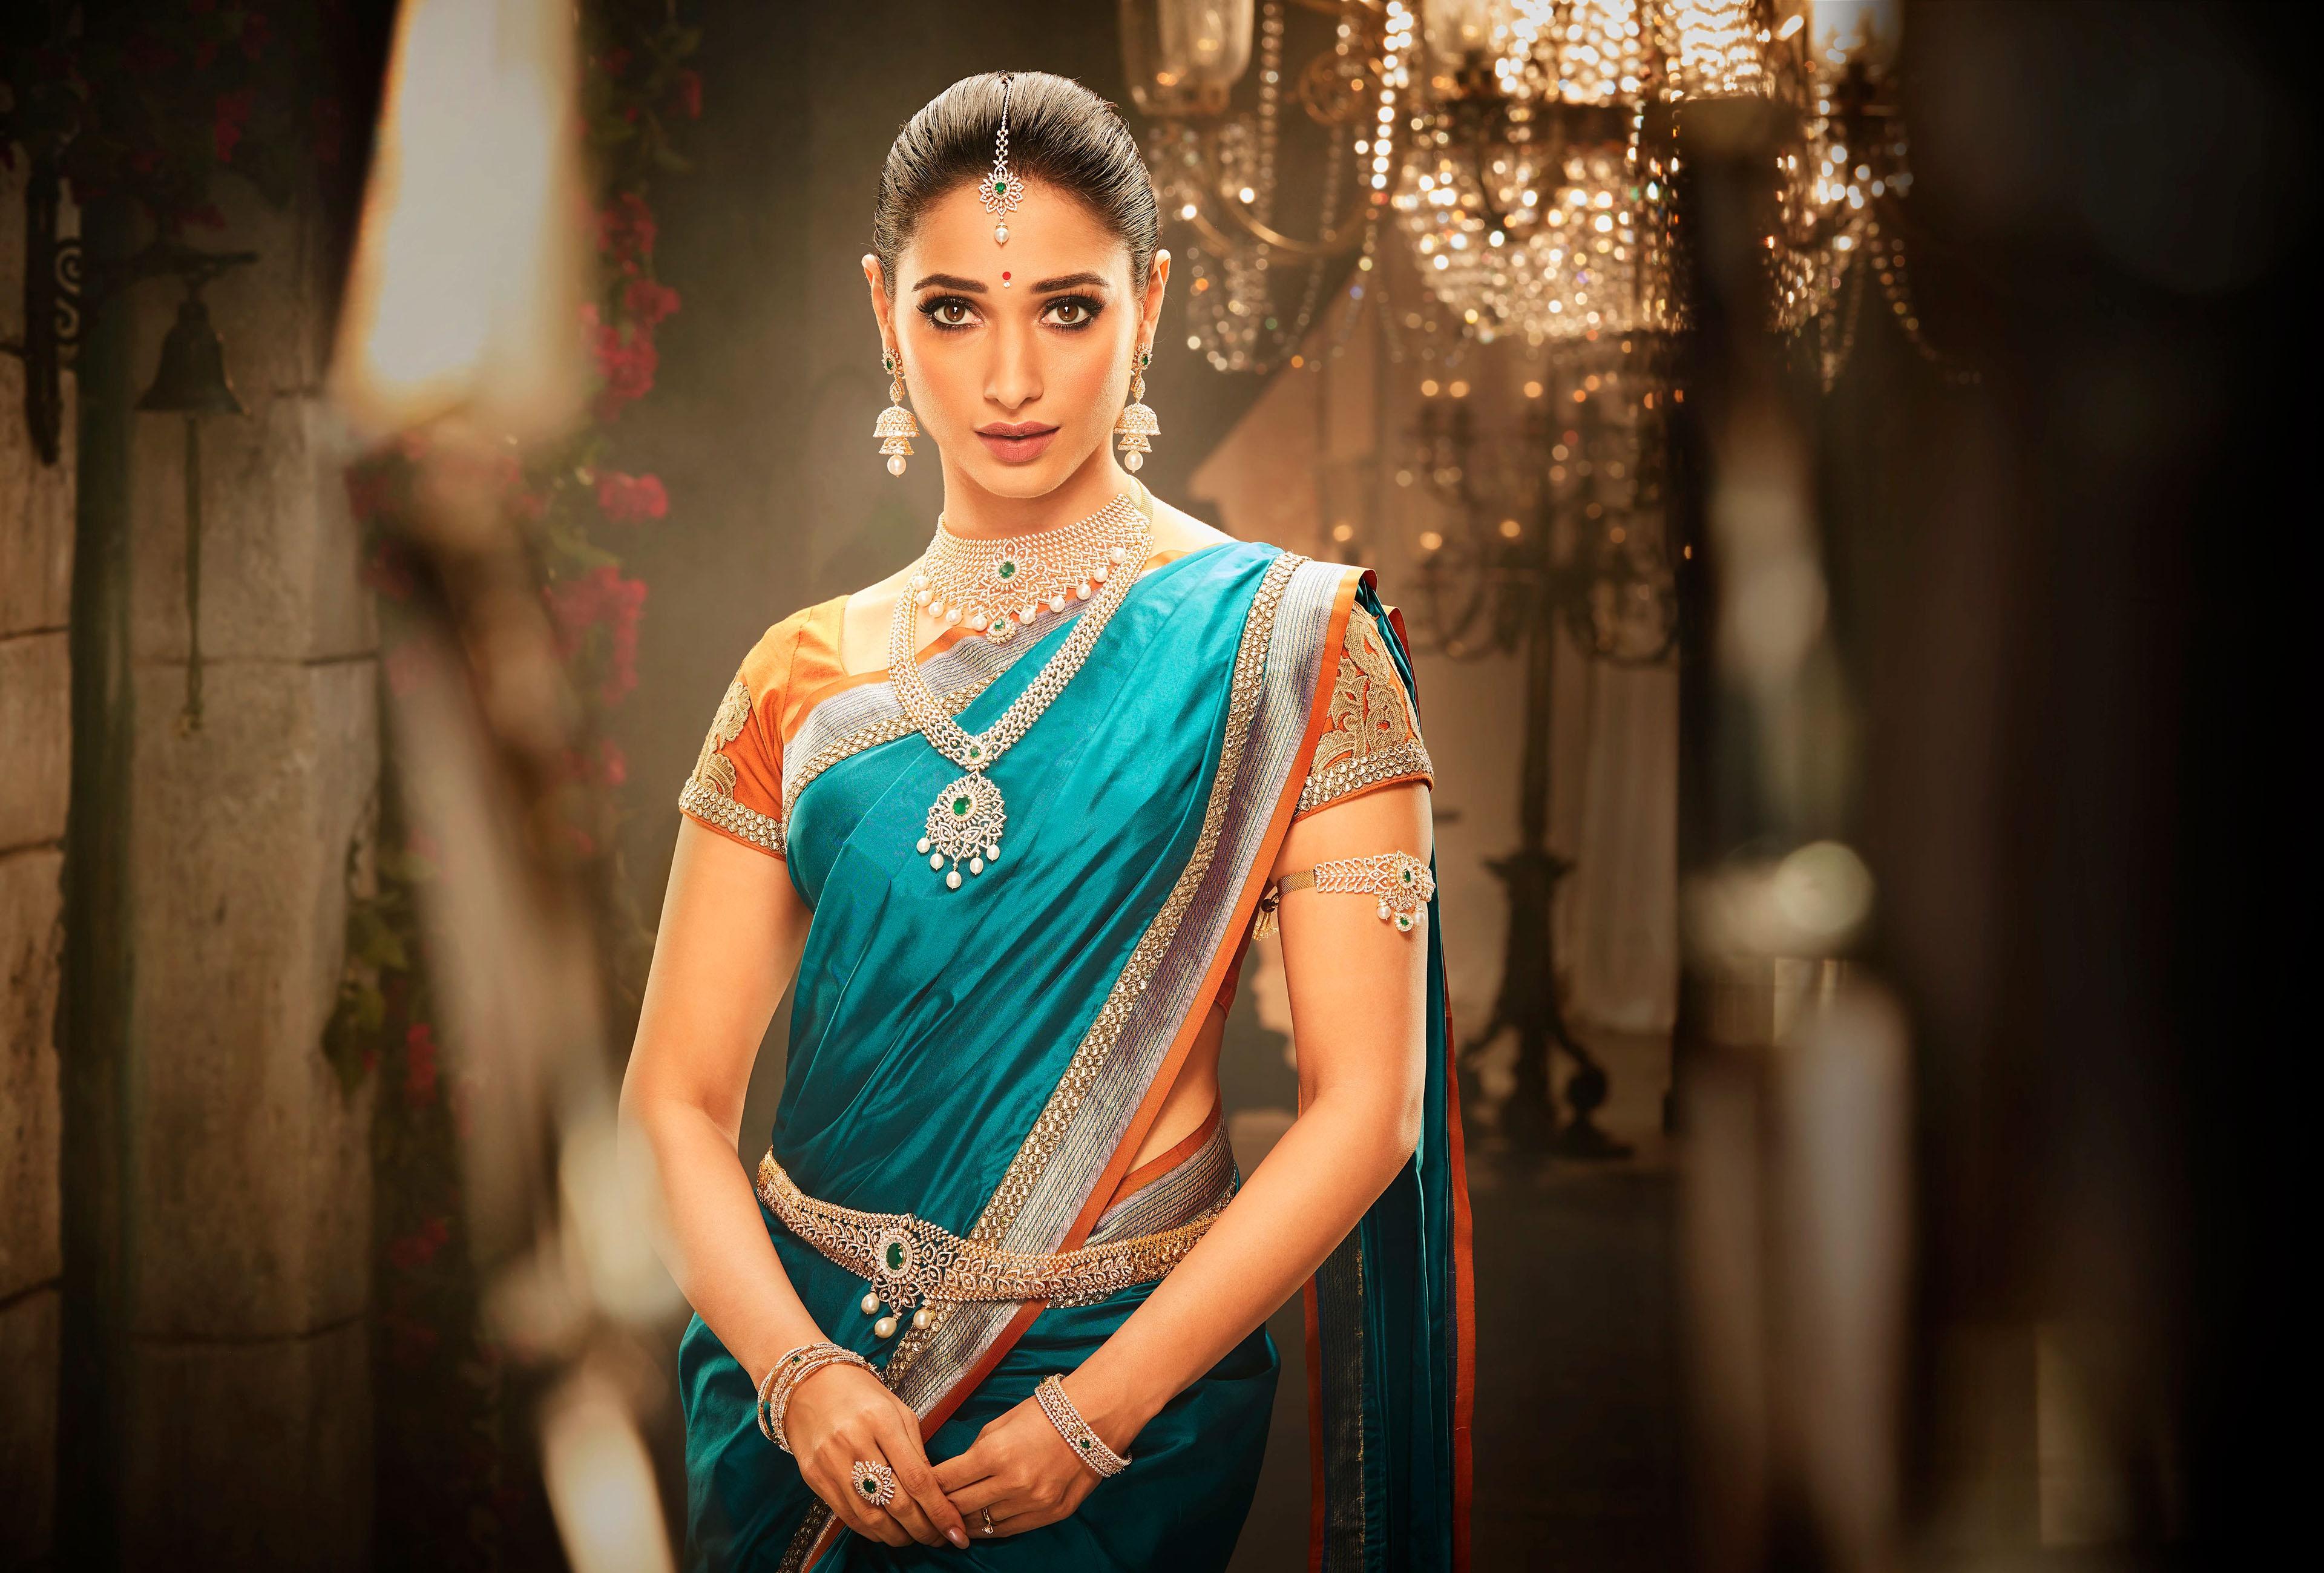 #saree, #traditional, #south Indian, #tamannaah, #ethnic - Tamanna Hd , HD Wallpaper & Backgrounds